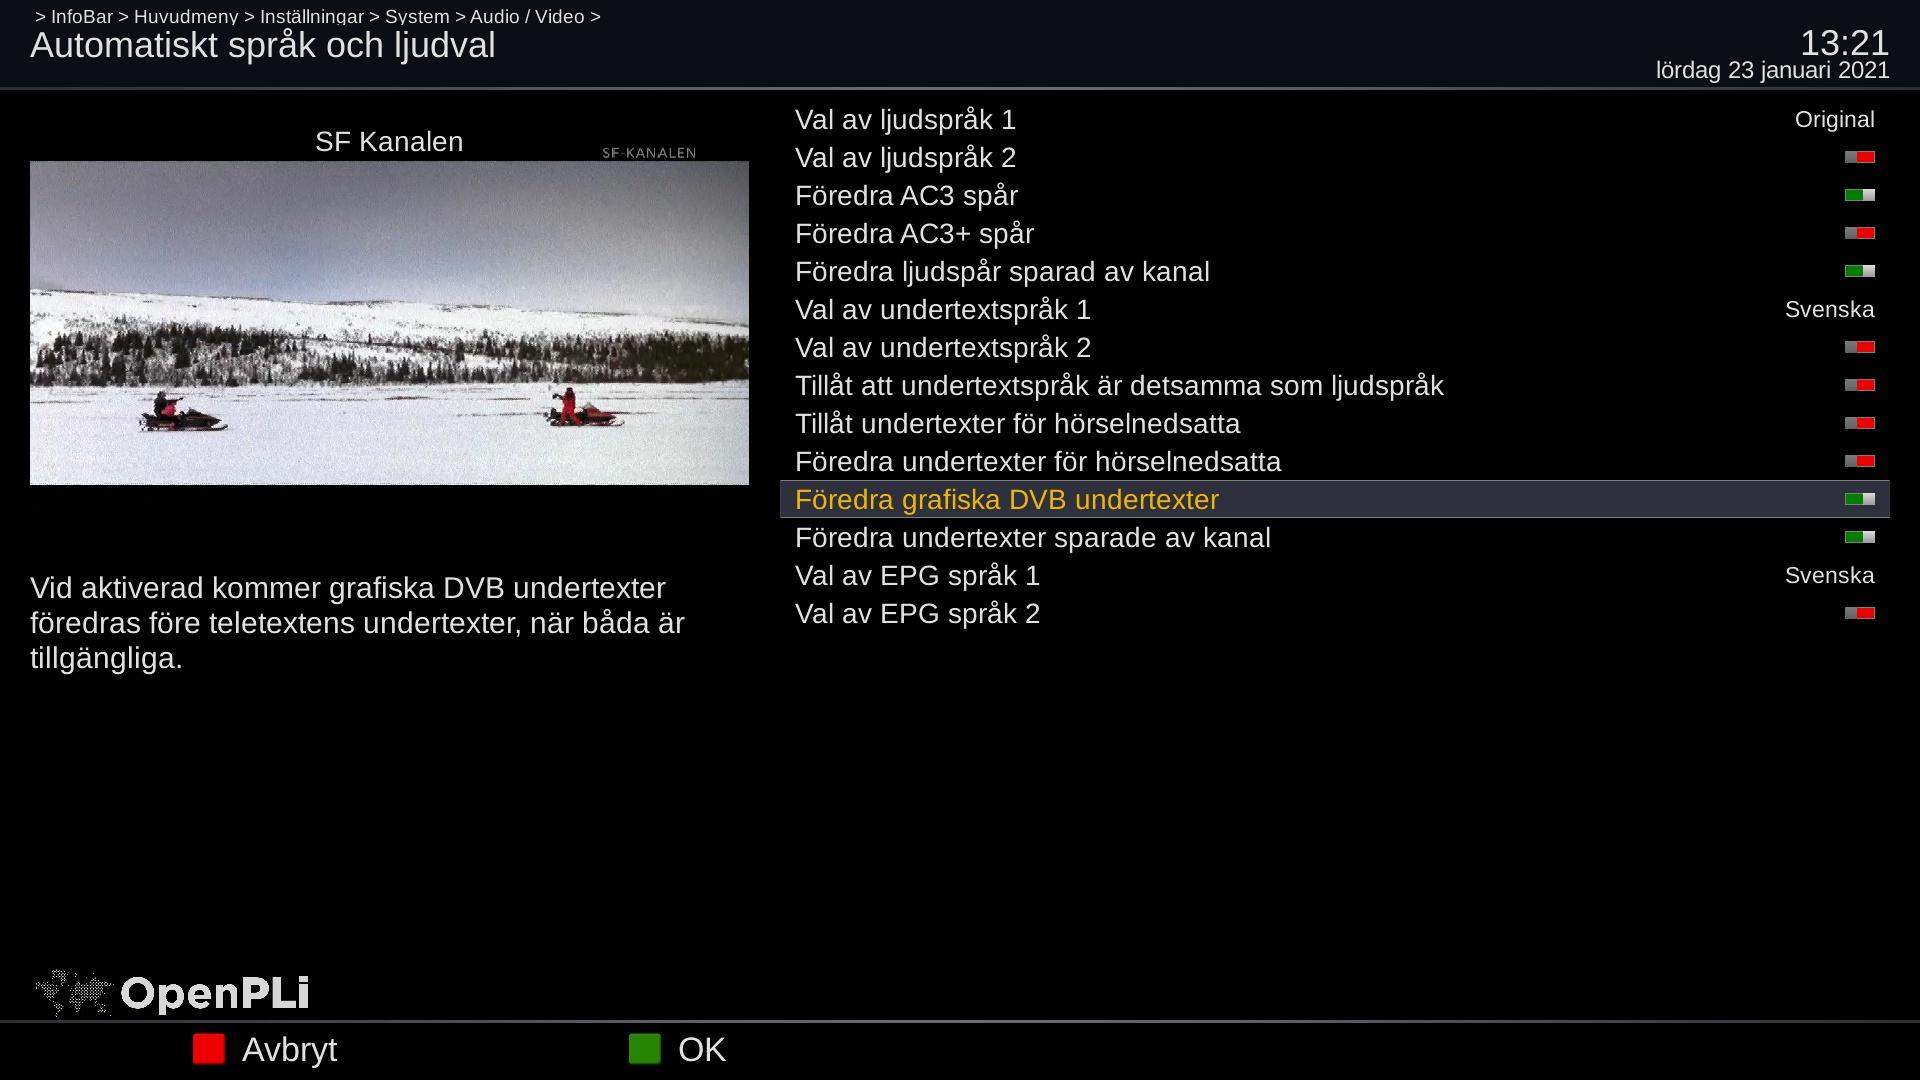 20210123-foredra-grafiska-DVB-undertexter.jpg